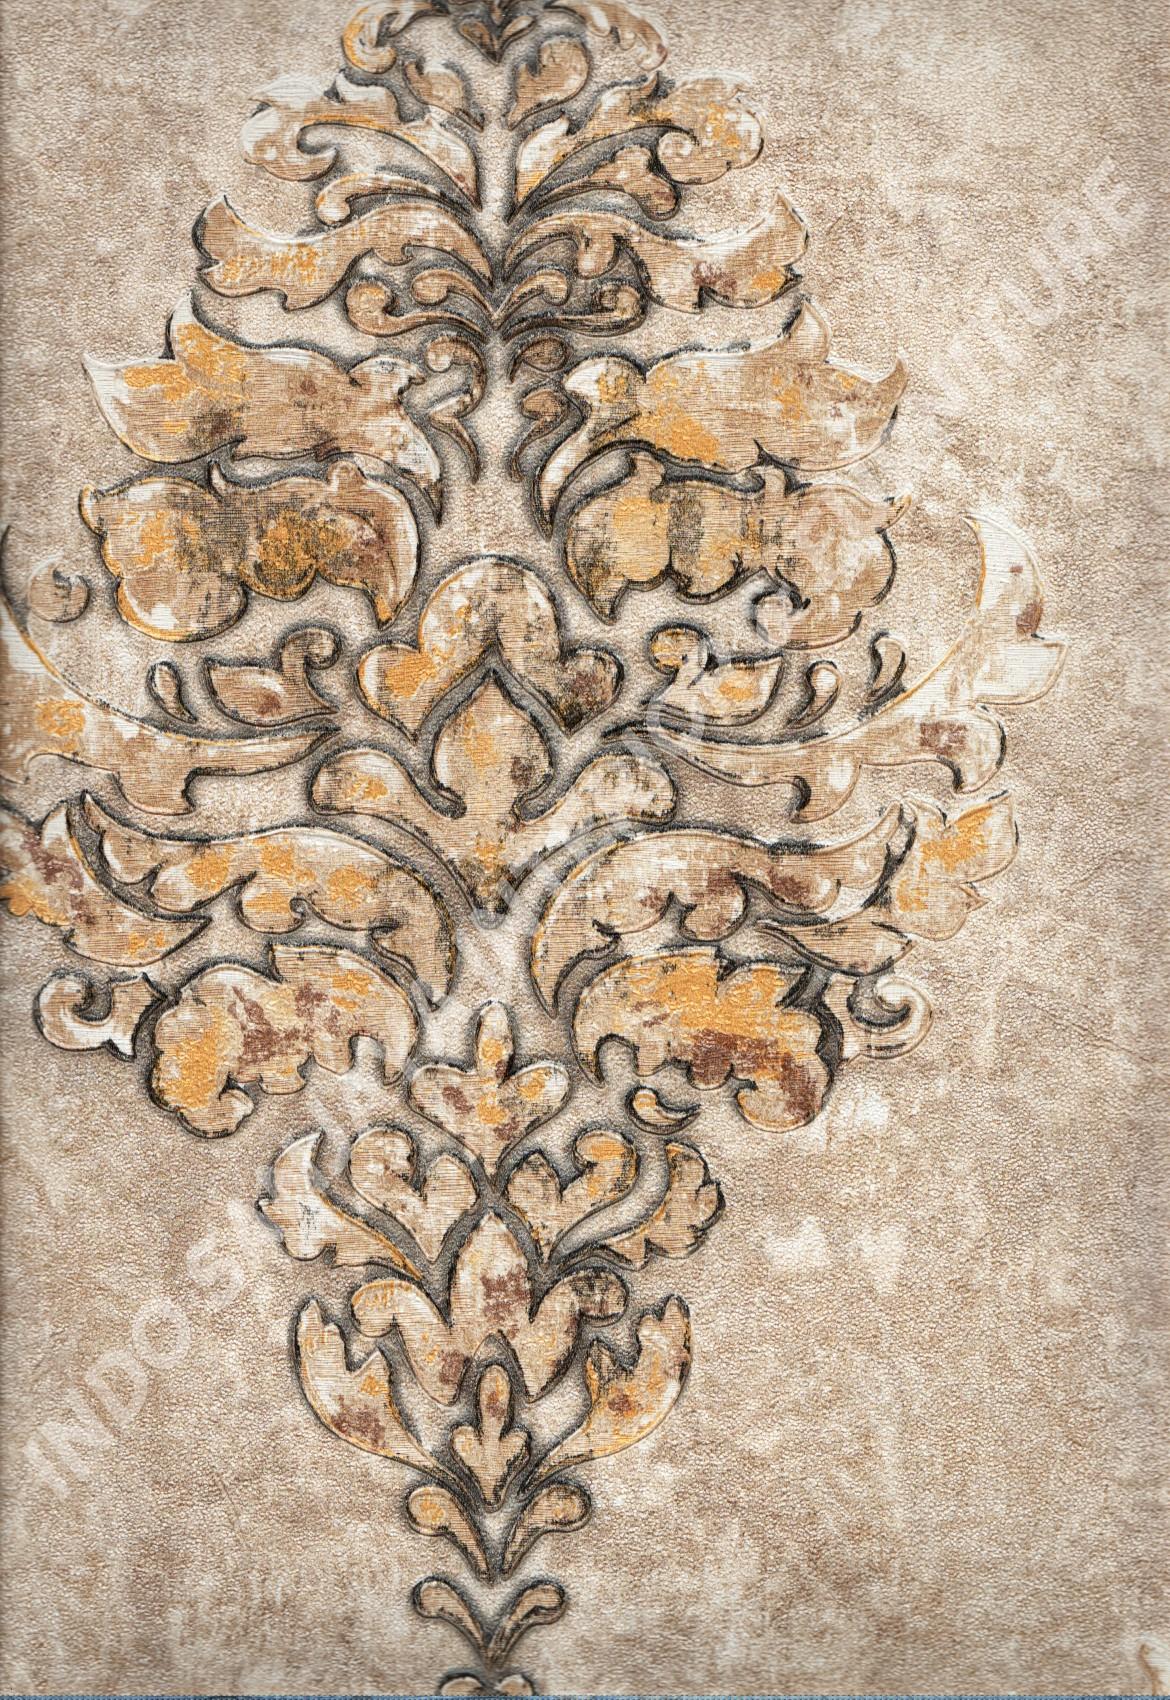 wallpaper   Wallpaper Klasik Batik (Damask) DL11302:DL11302 corak  warna